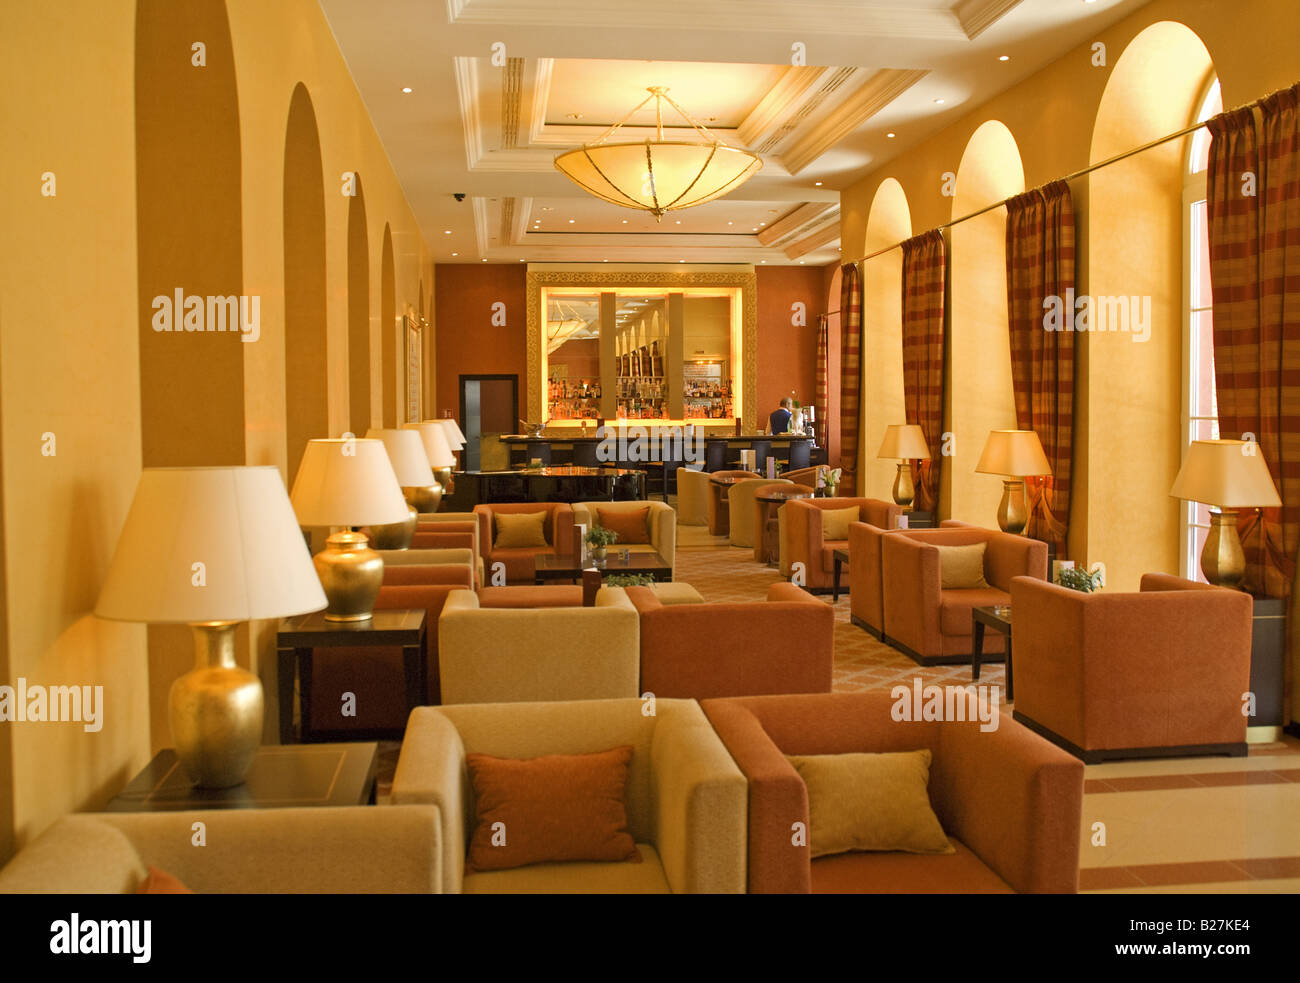 Hilton Hotel Lobby Stock Photos & Hilton Hotel Lobby Stock ...